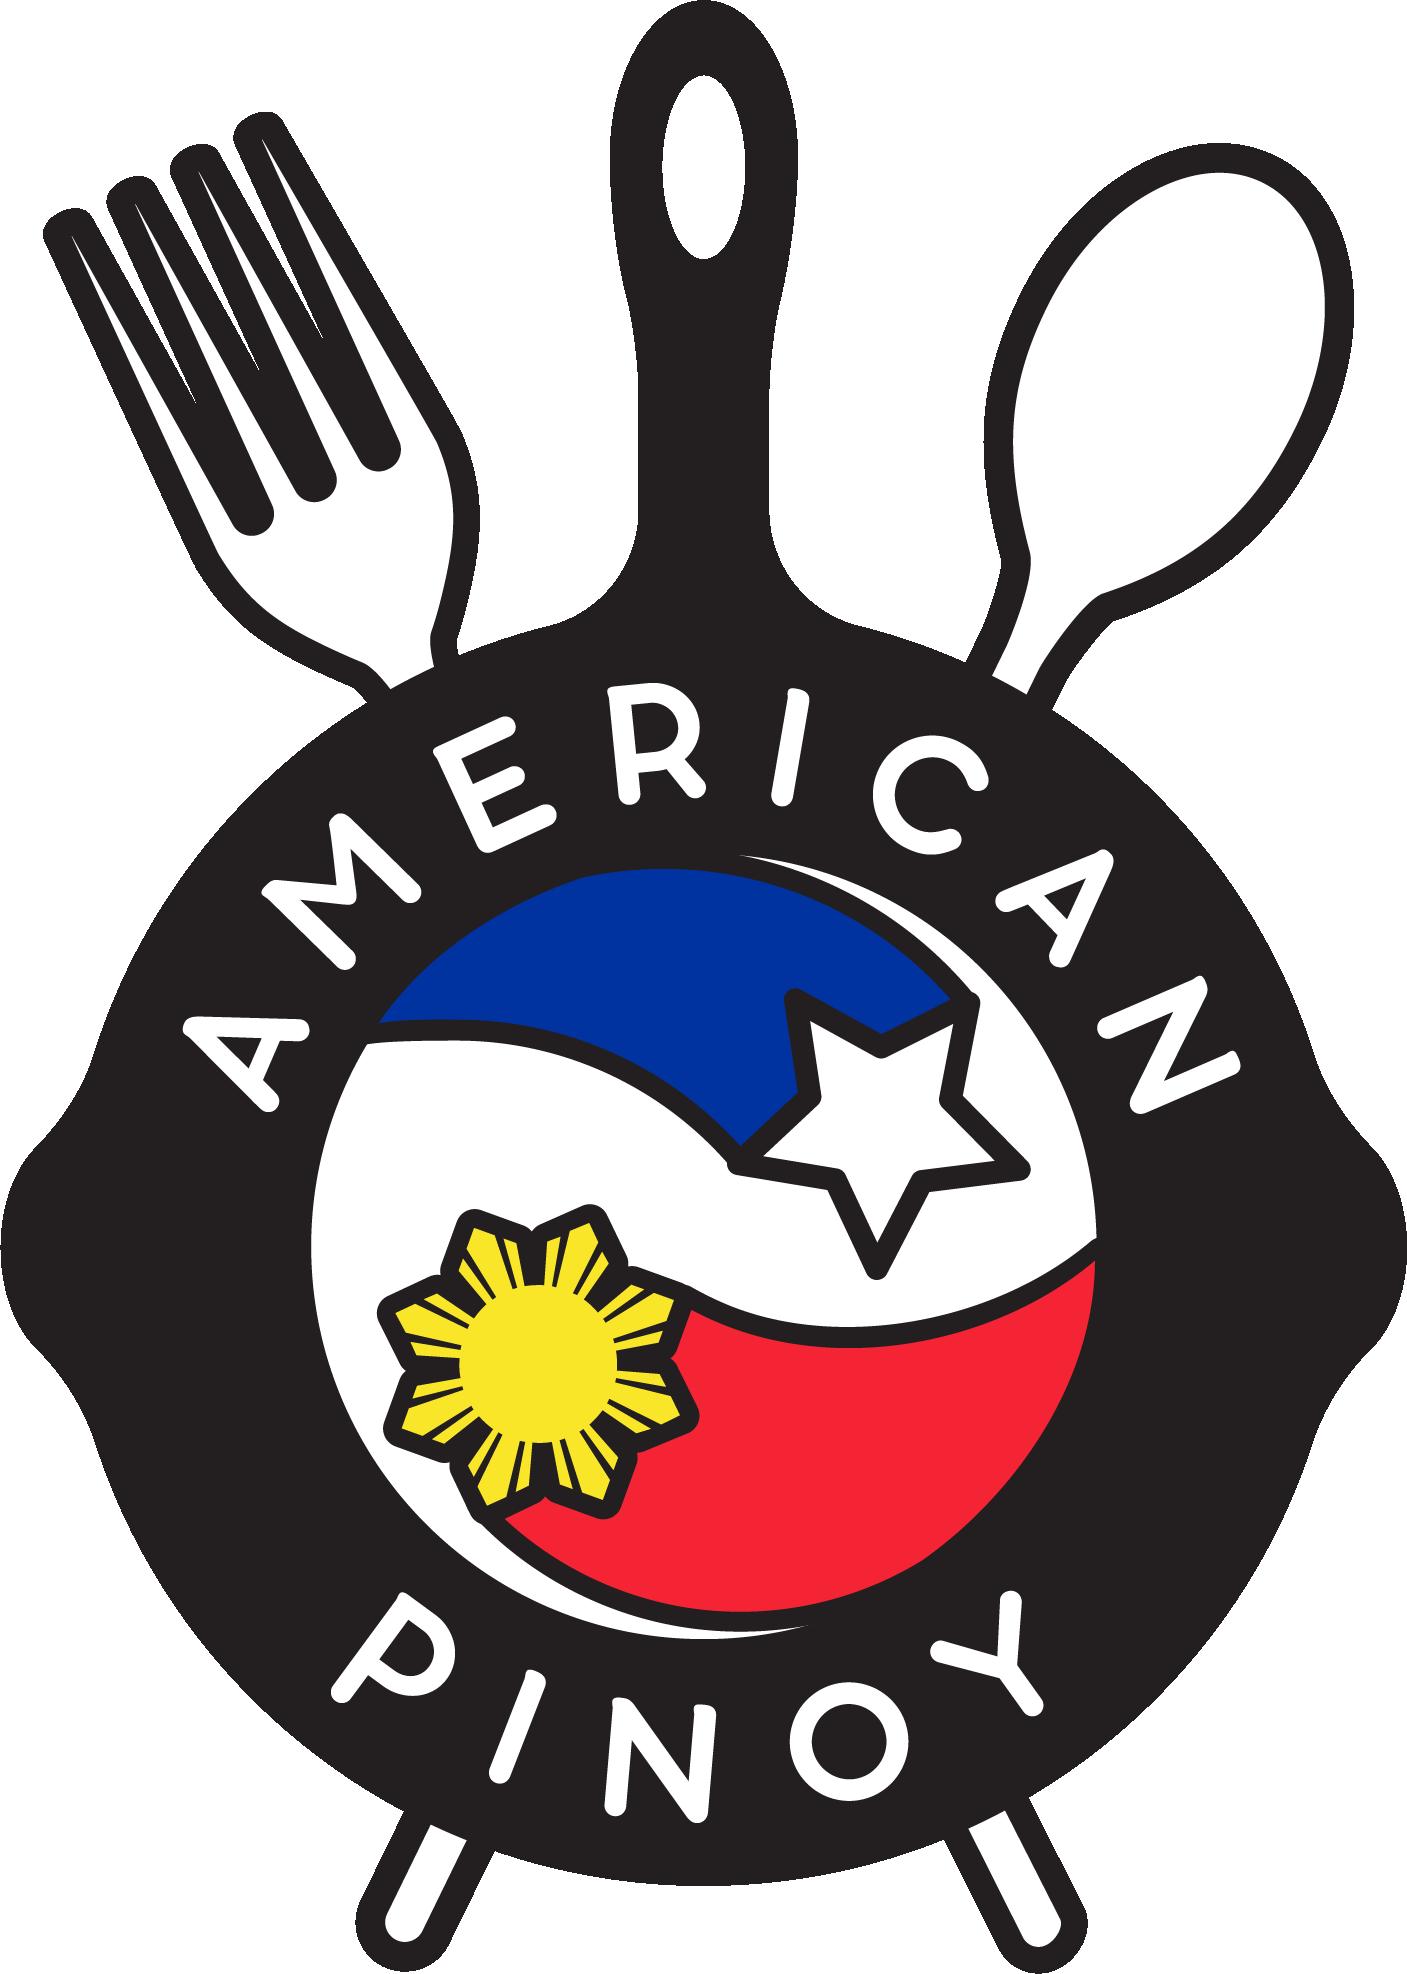 Respect clipart symbol filipino. American pinoy